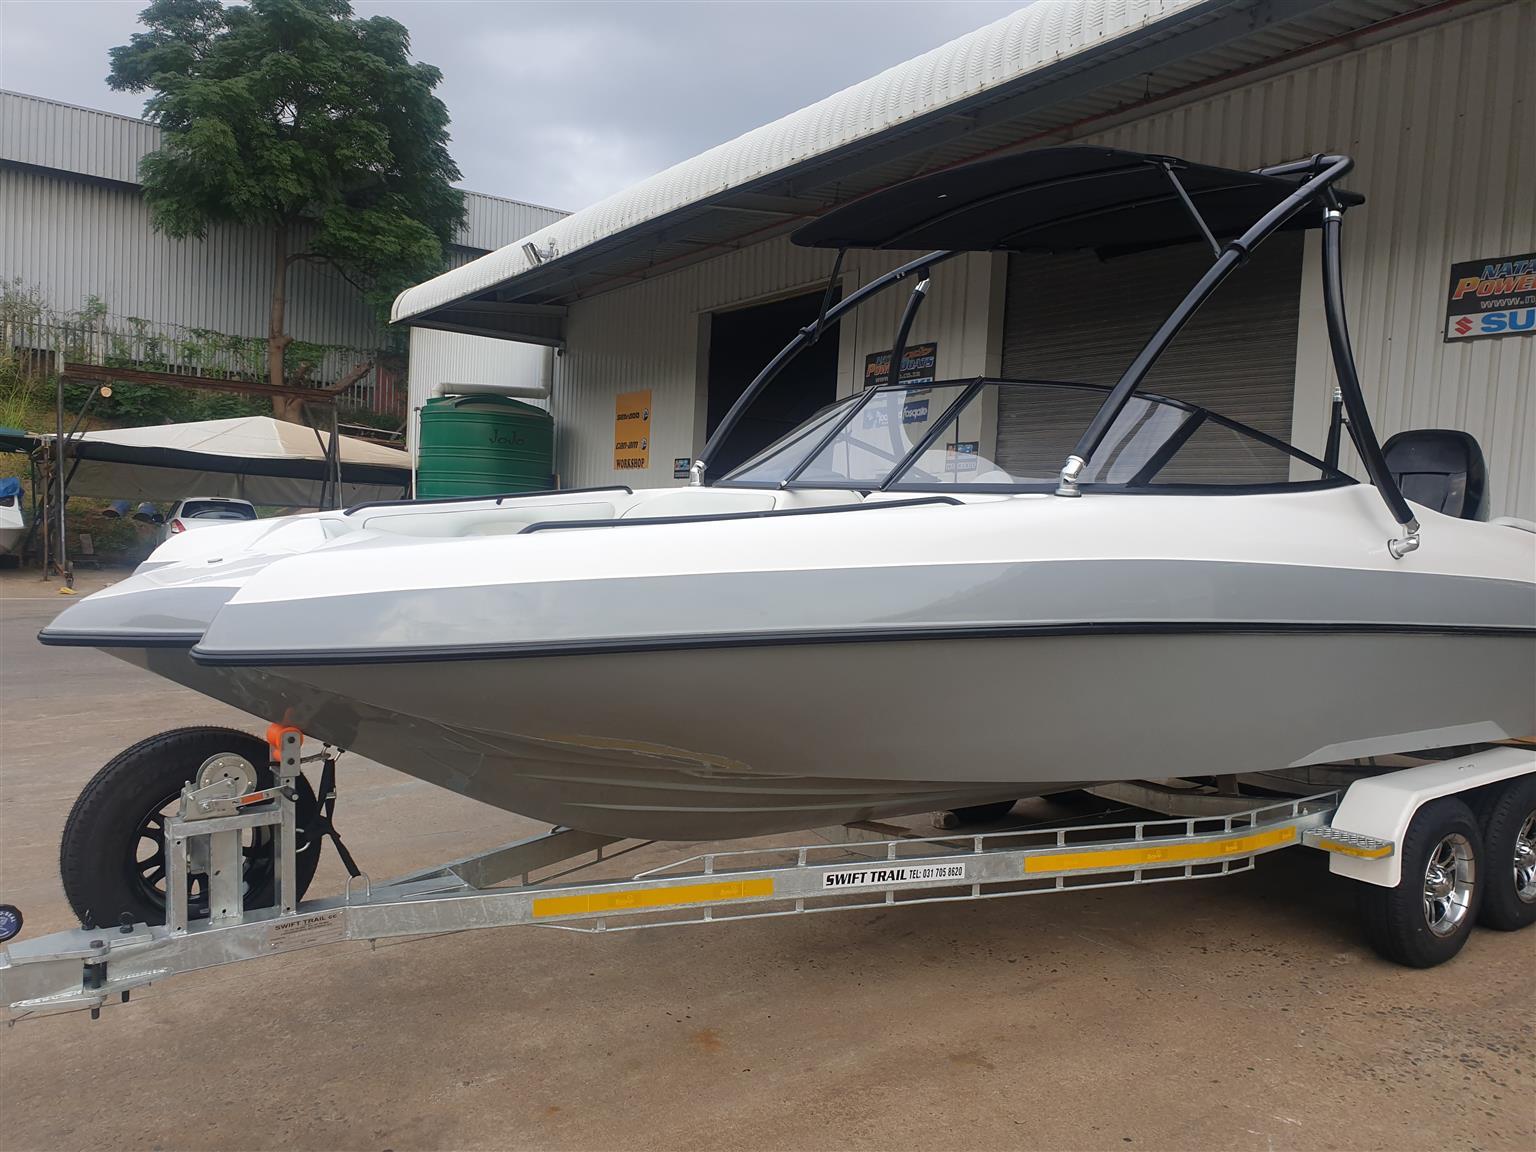 classic 230 on trailer 2020 model 250 hp mercury verado 4 stroke